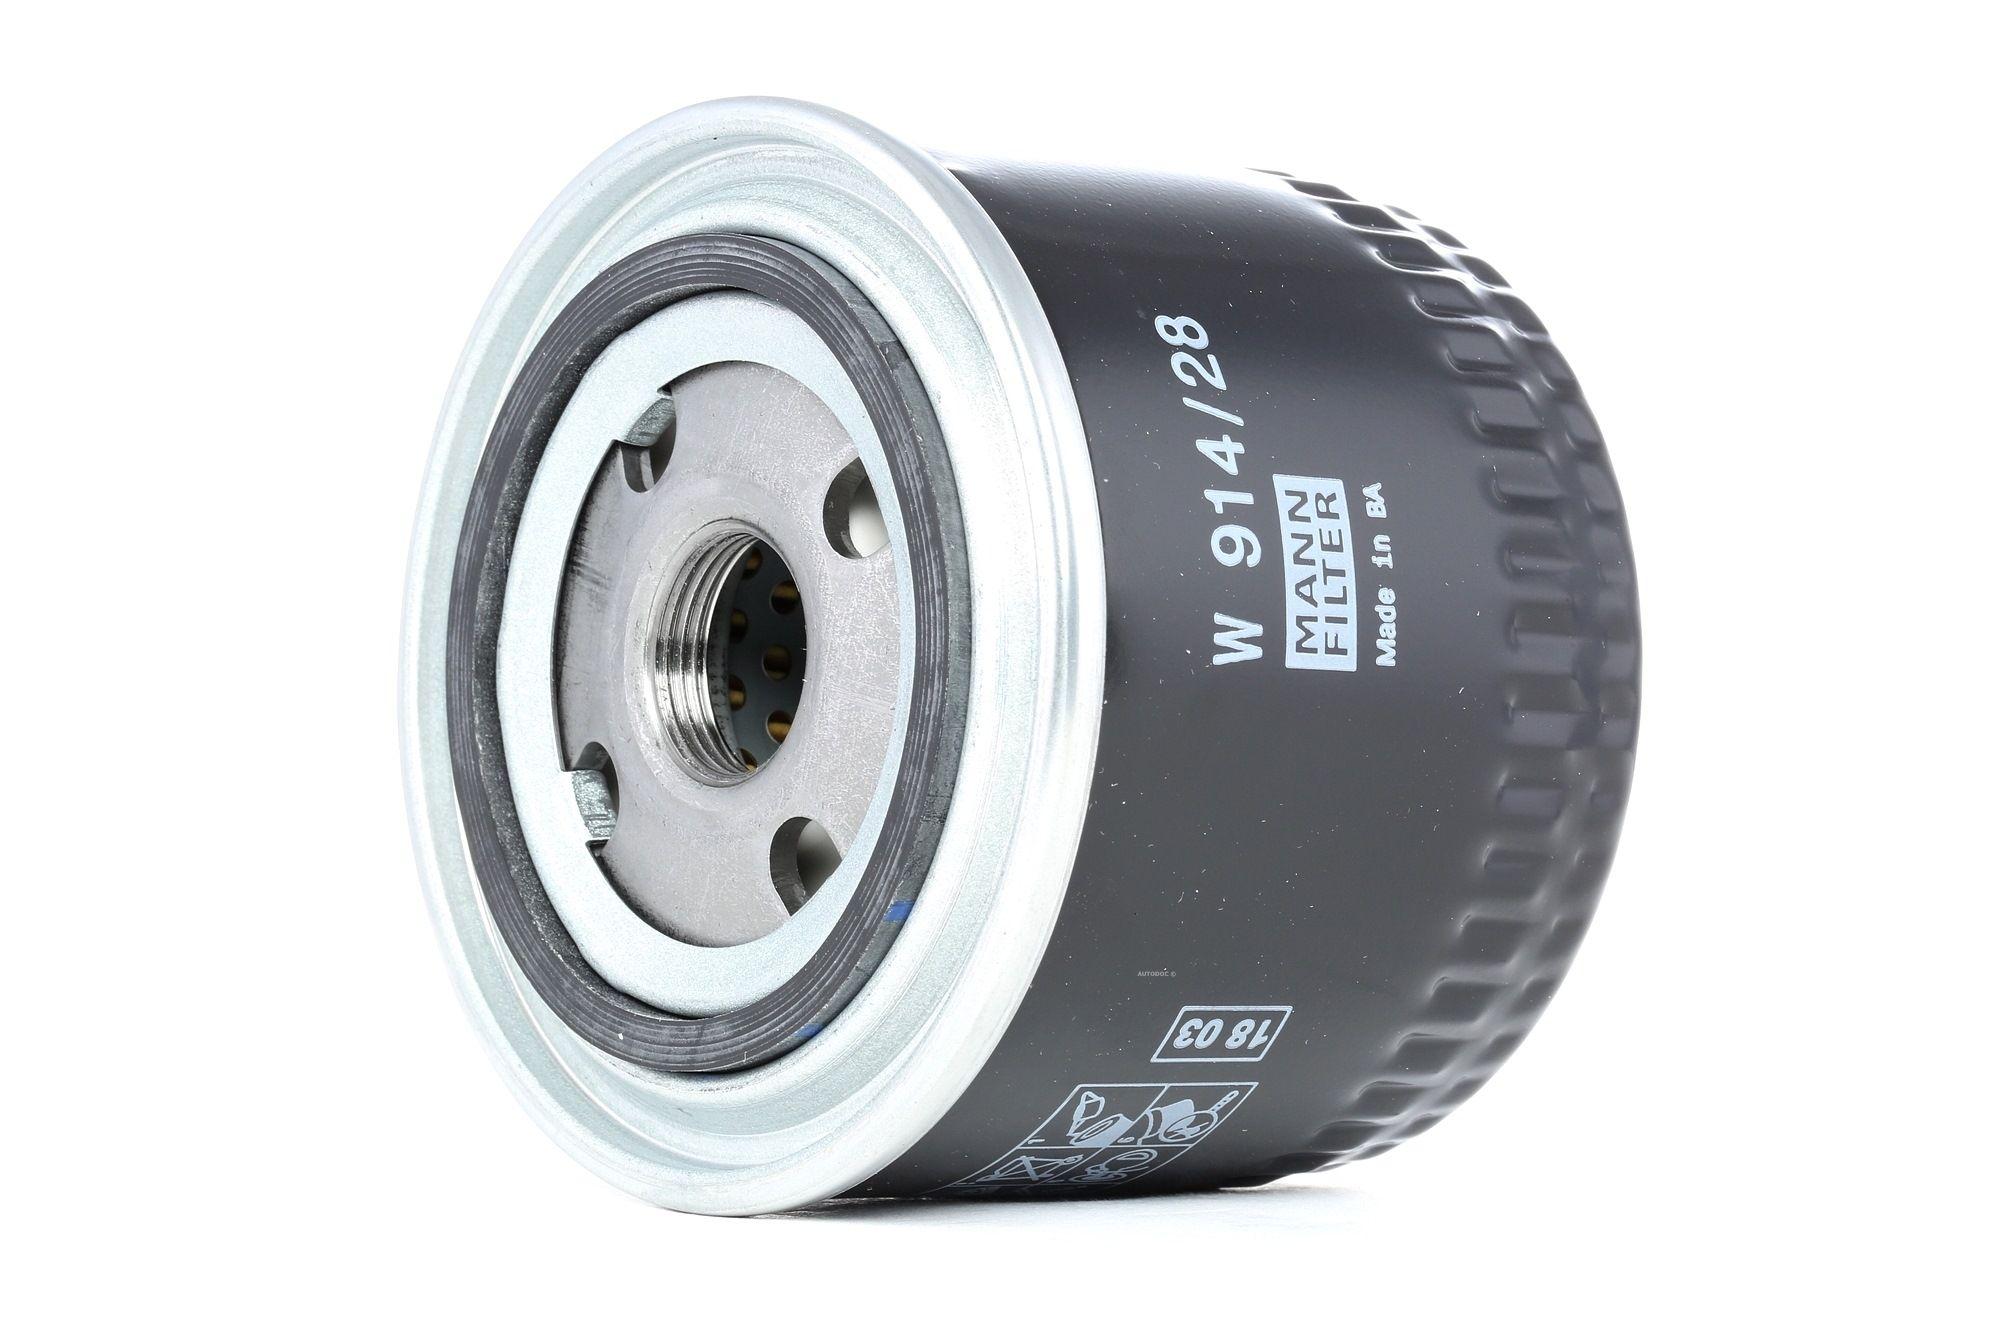 W 914/28 MANN-FILTER with one anti-return valve Inner Diameter 2: 63mm, Ø: 93mm, Outer diameter 2: 72mm, Height: 78mm Oil Filter W 914/28 cheap